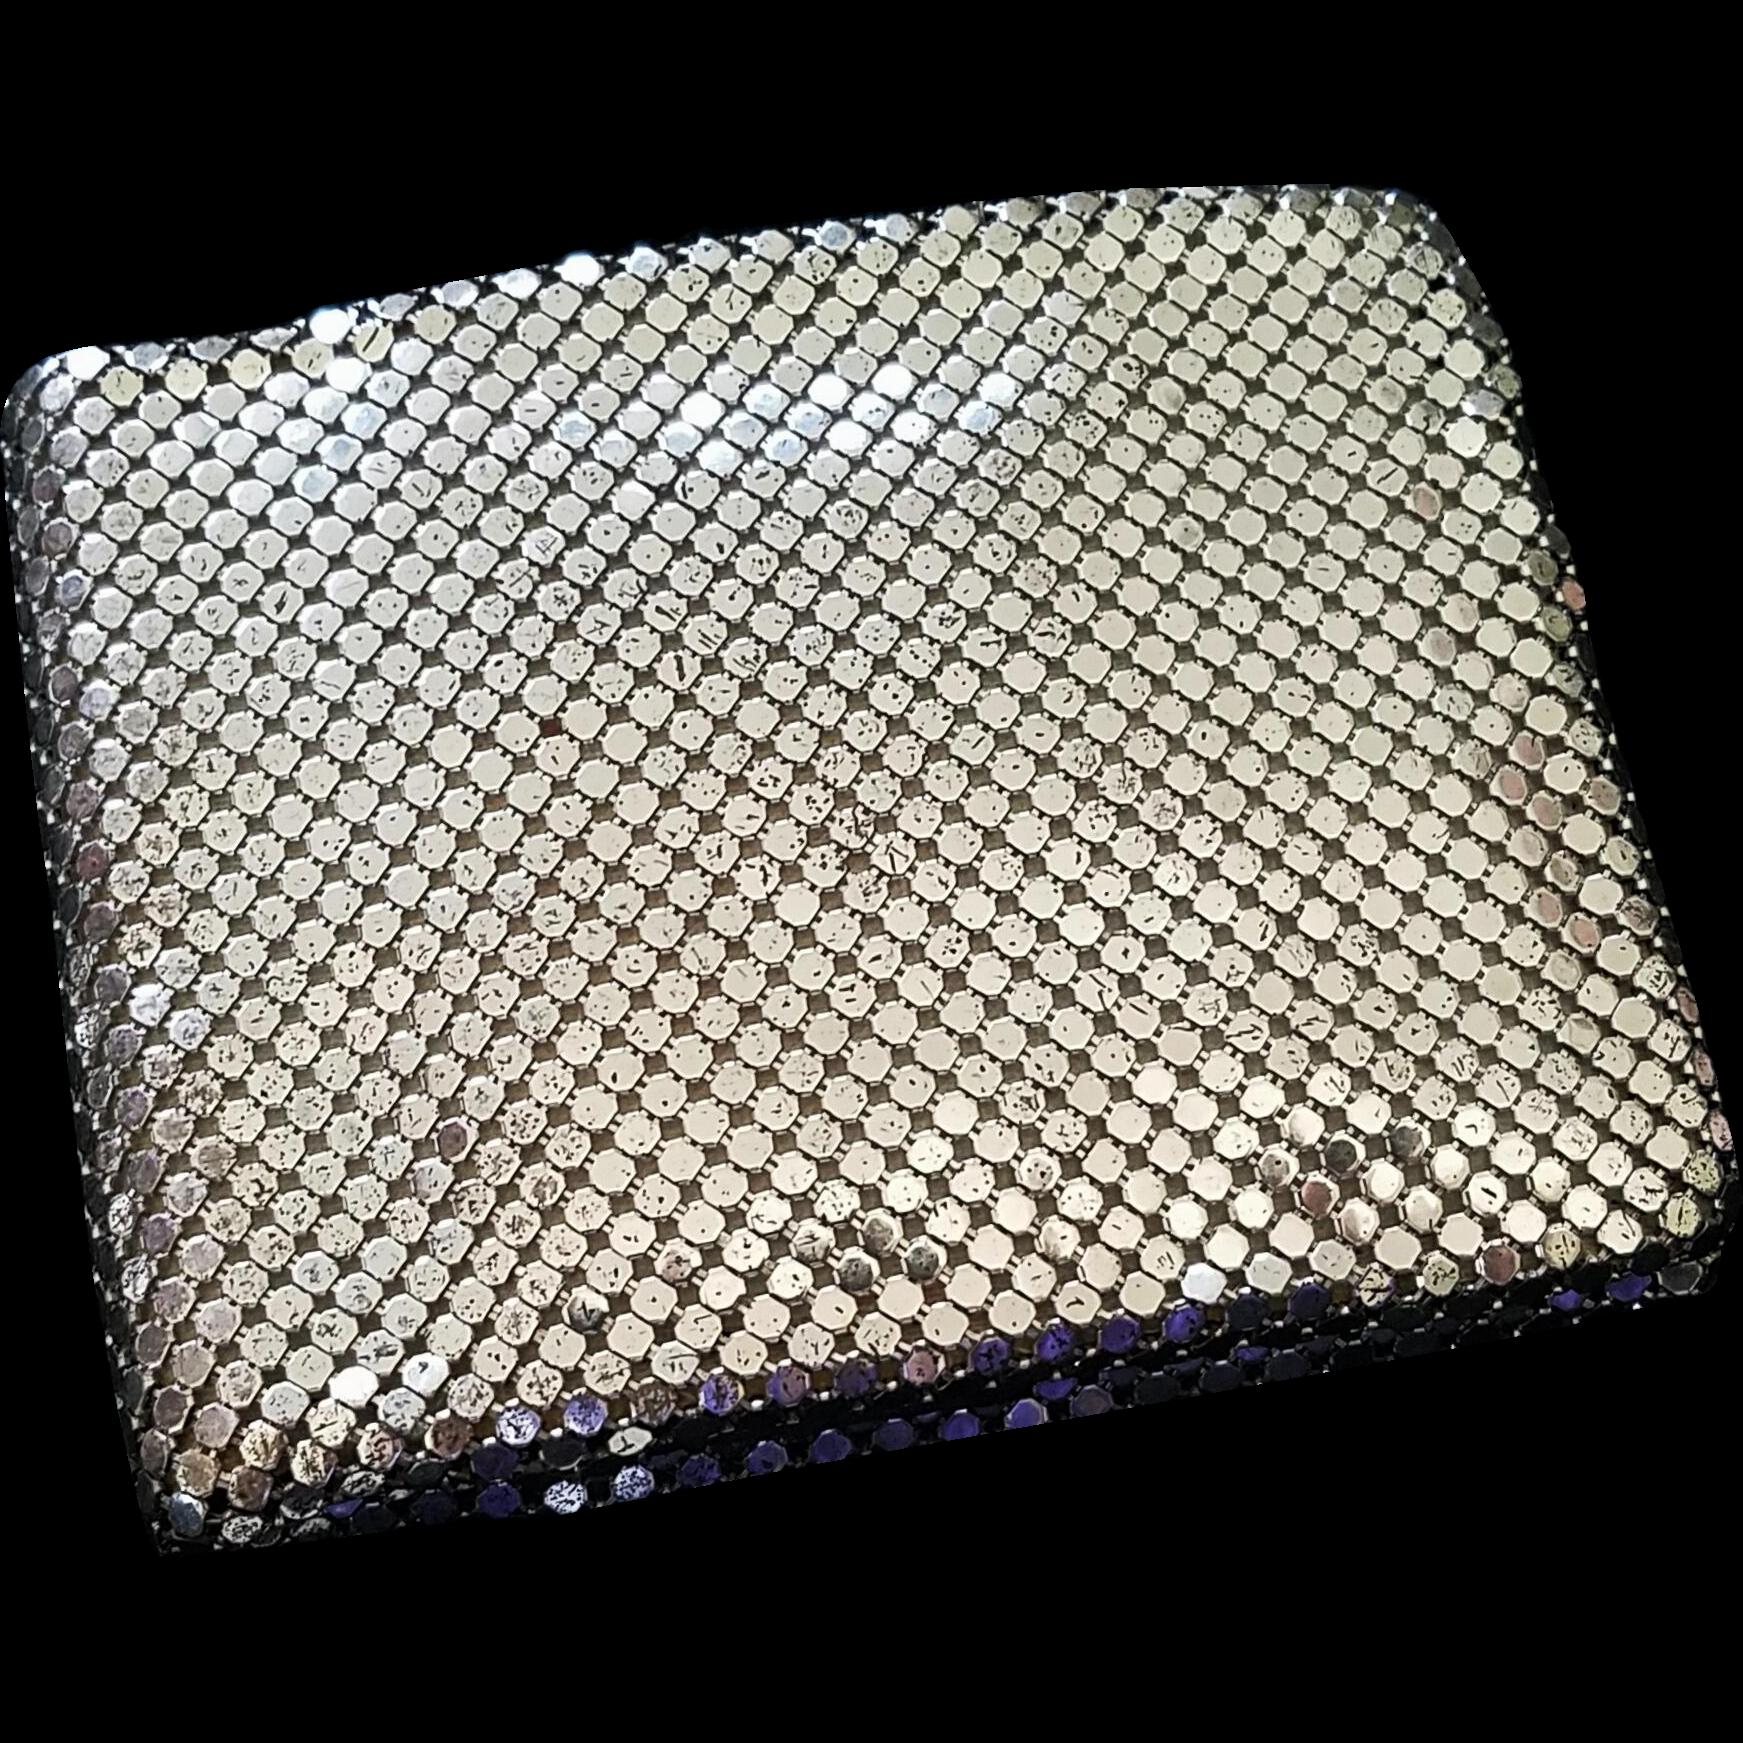 Vintage Whiting and Davis Silvertone Mesh Bifold Wallet